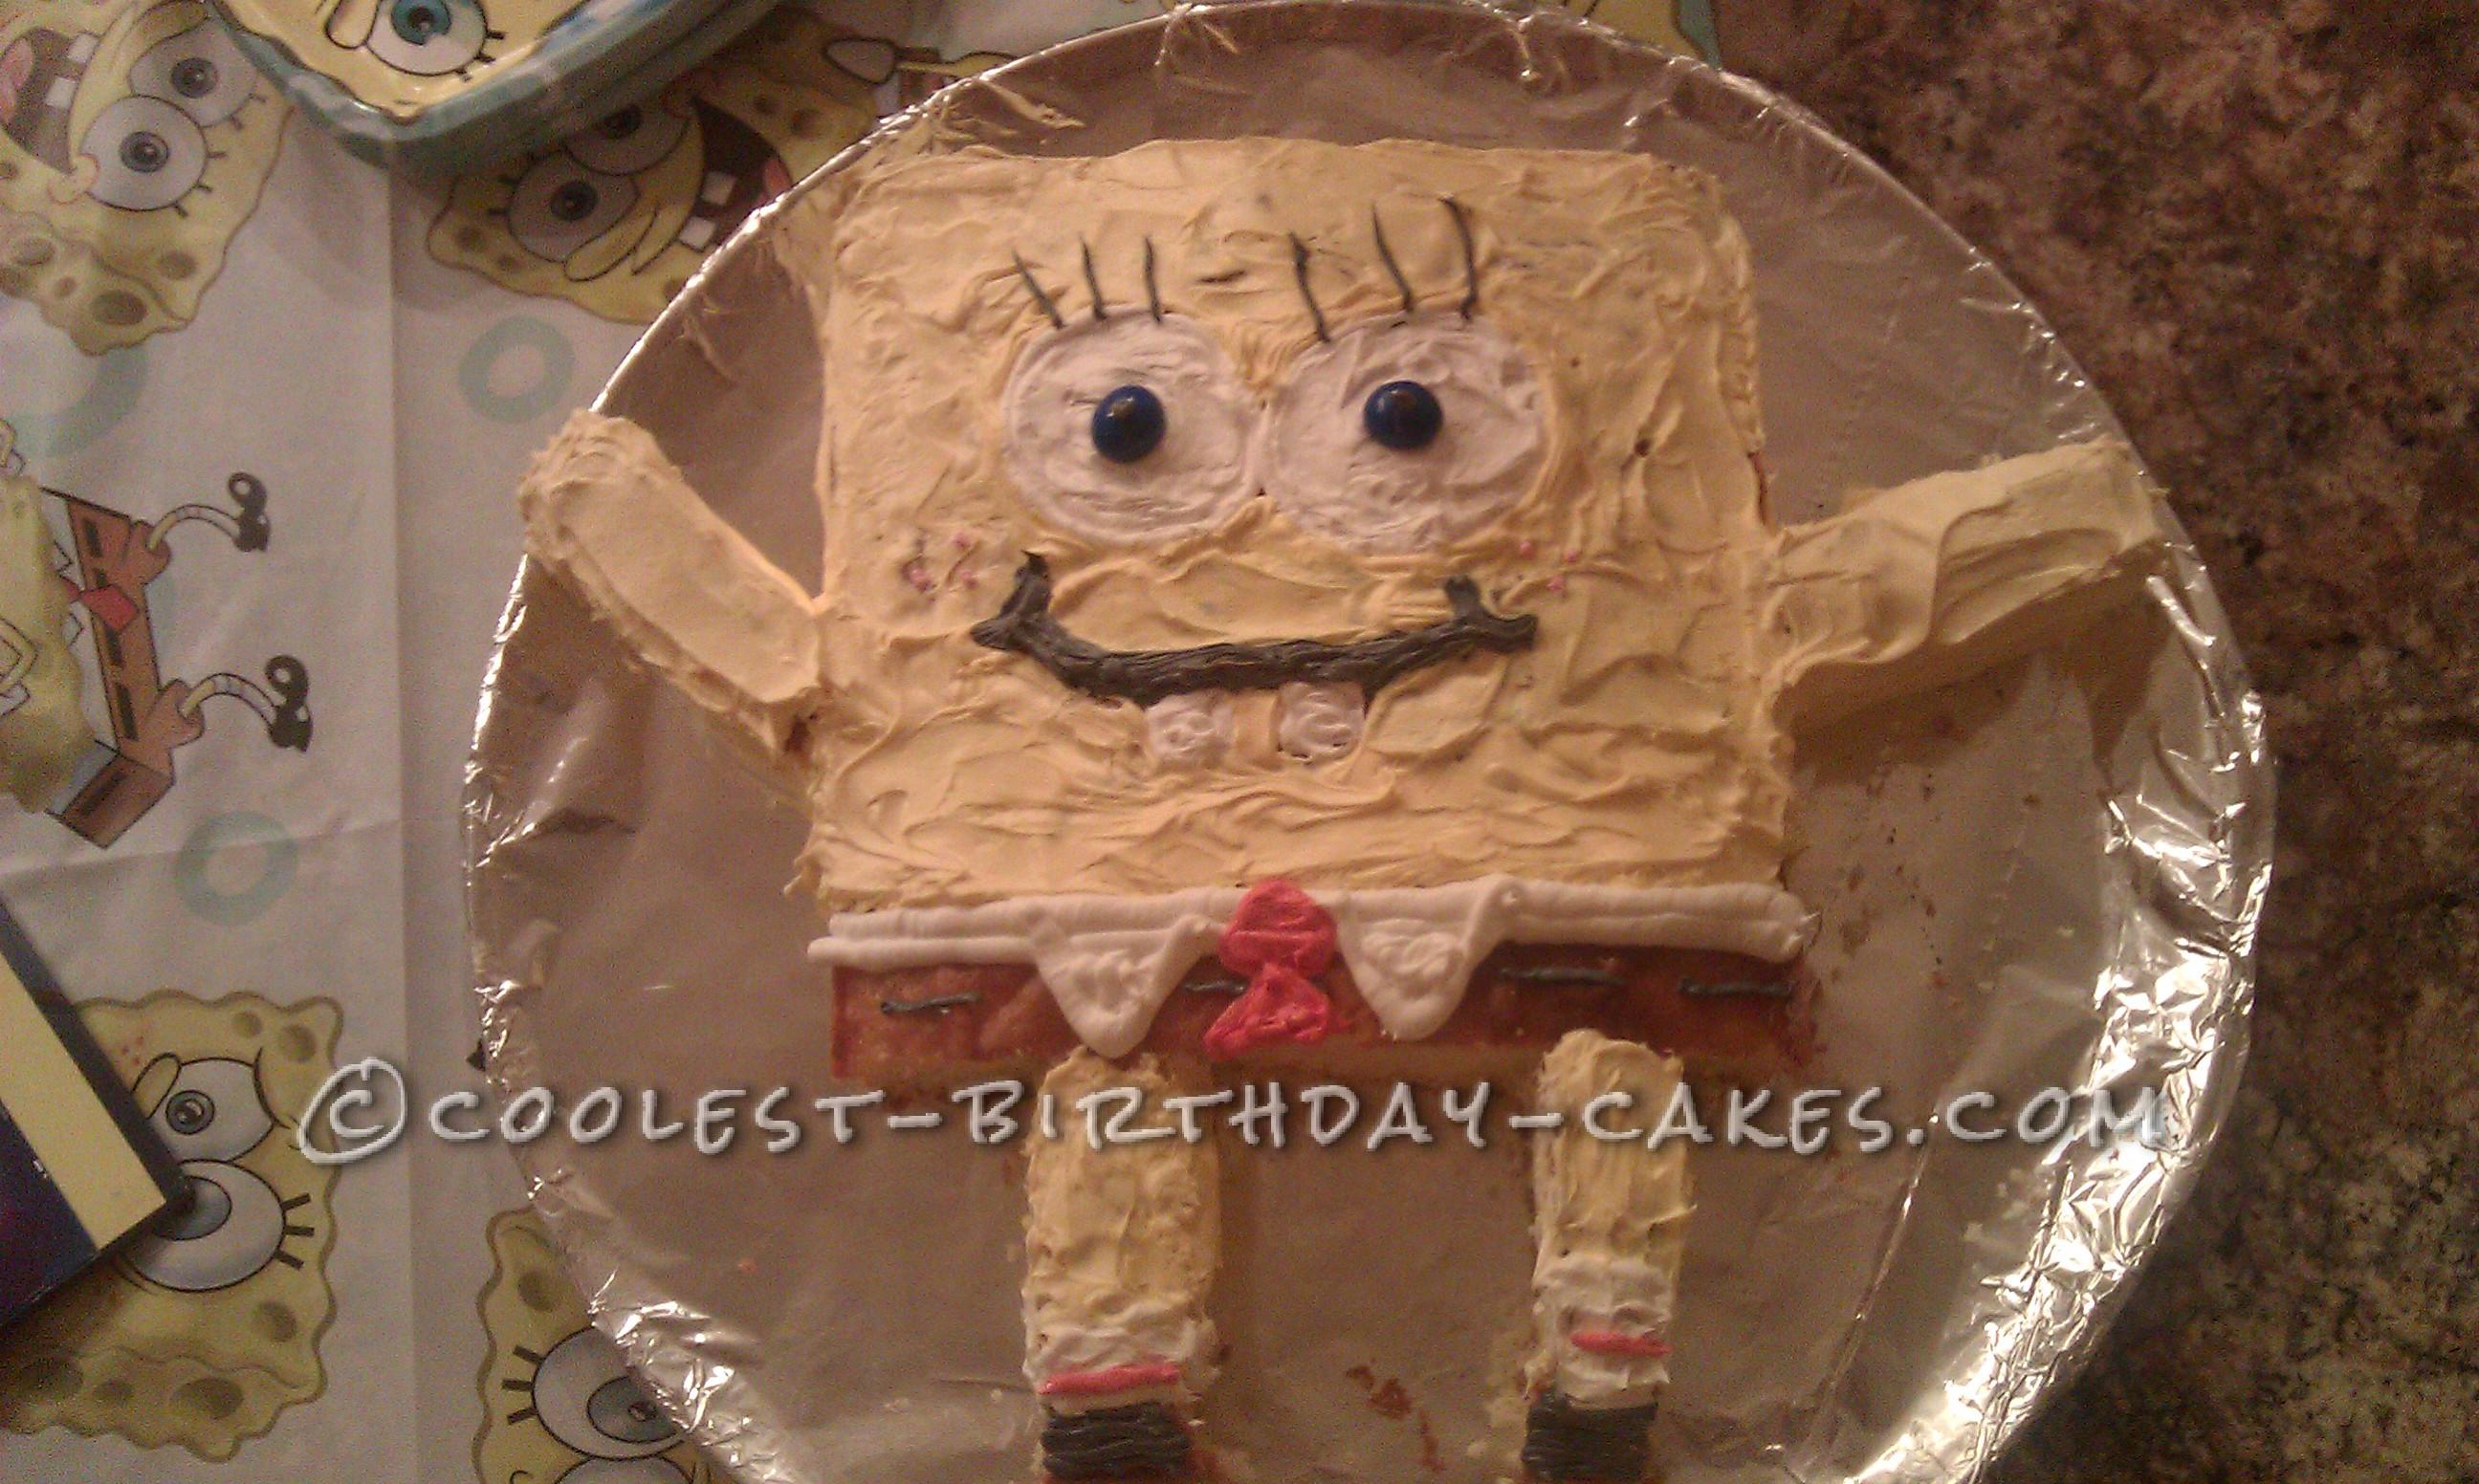 Coolest Sponge Bob and Patrick Birthday Cake